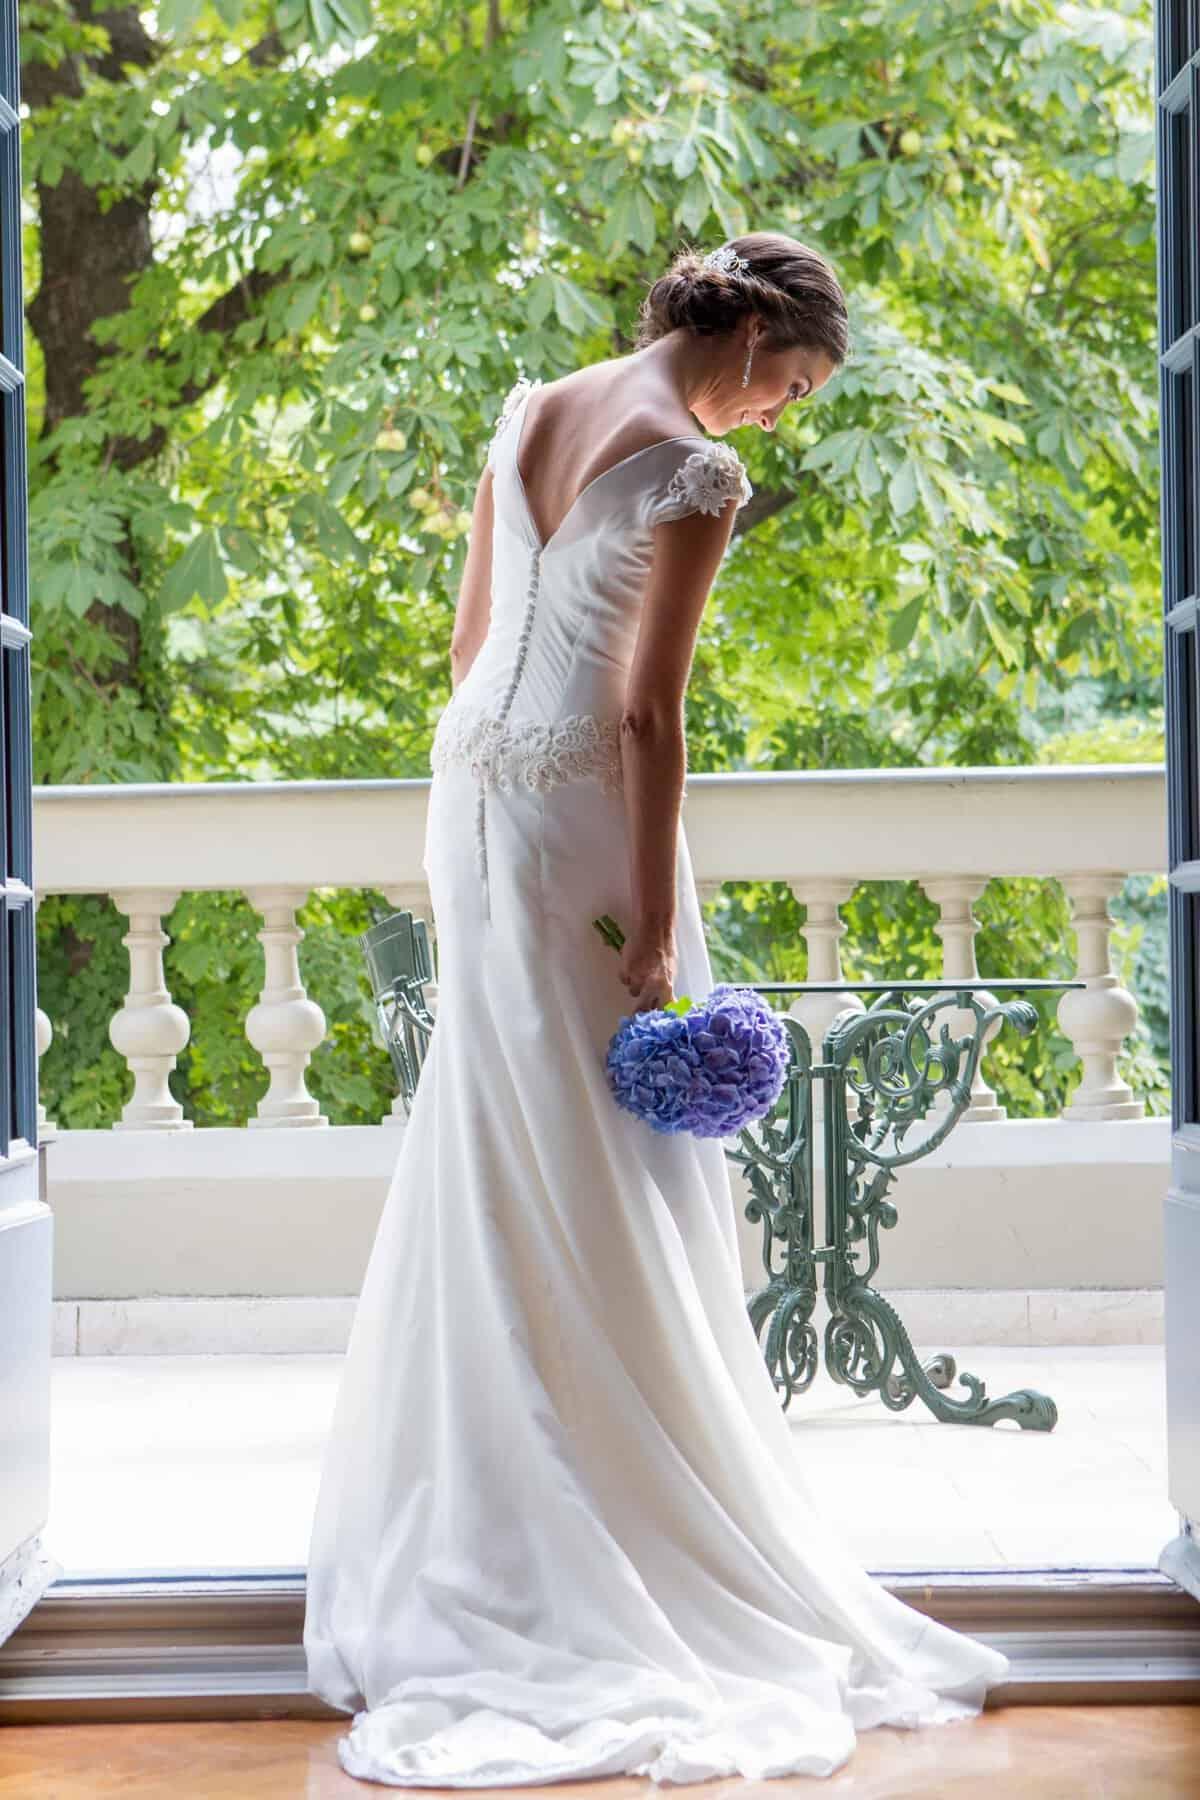 Vestido de novia con flores azules